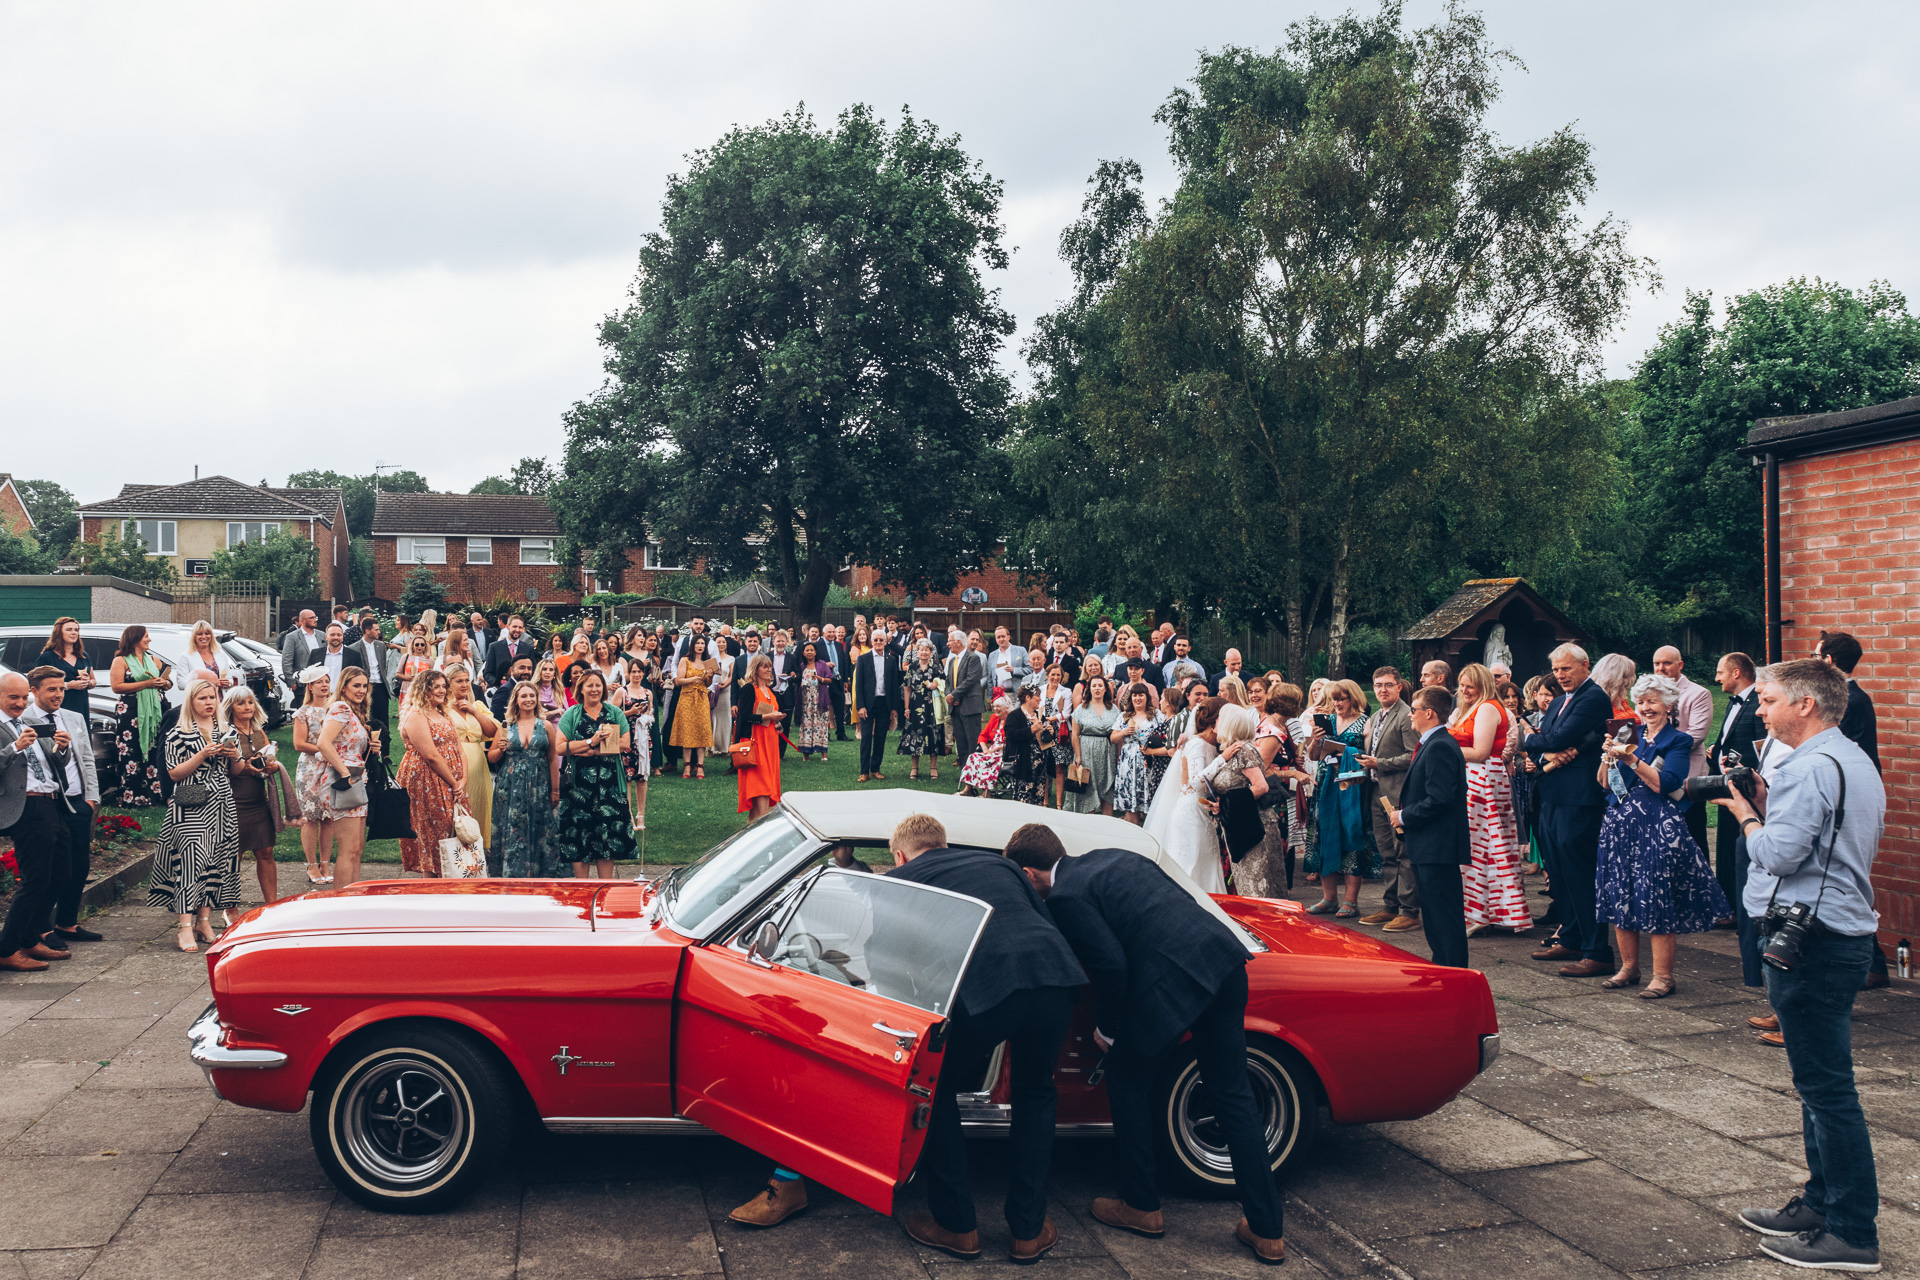 Bride and groom getting into wedding car